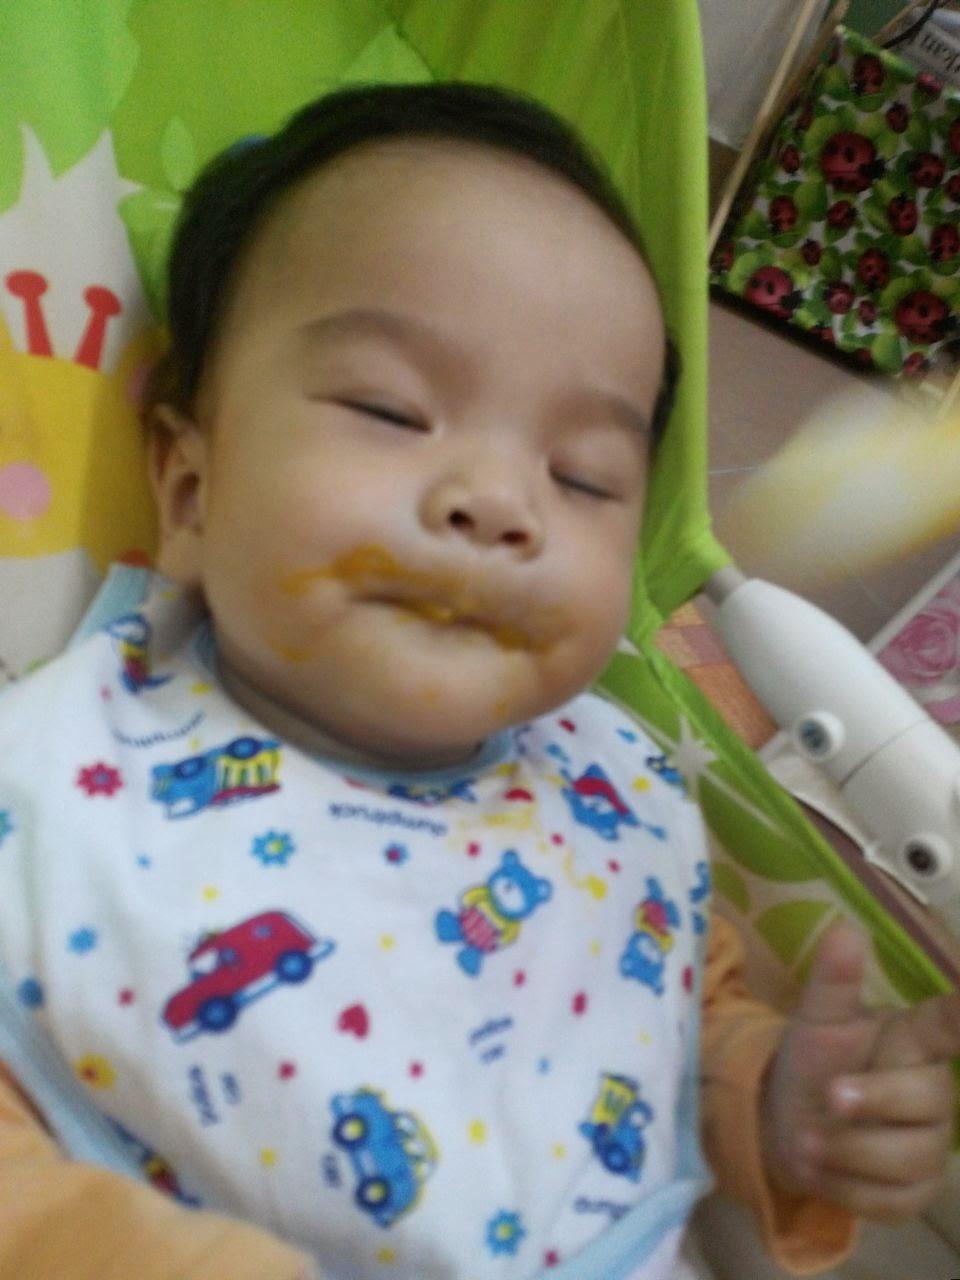 Makanan Pejal Pertama Untuk Bayi